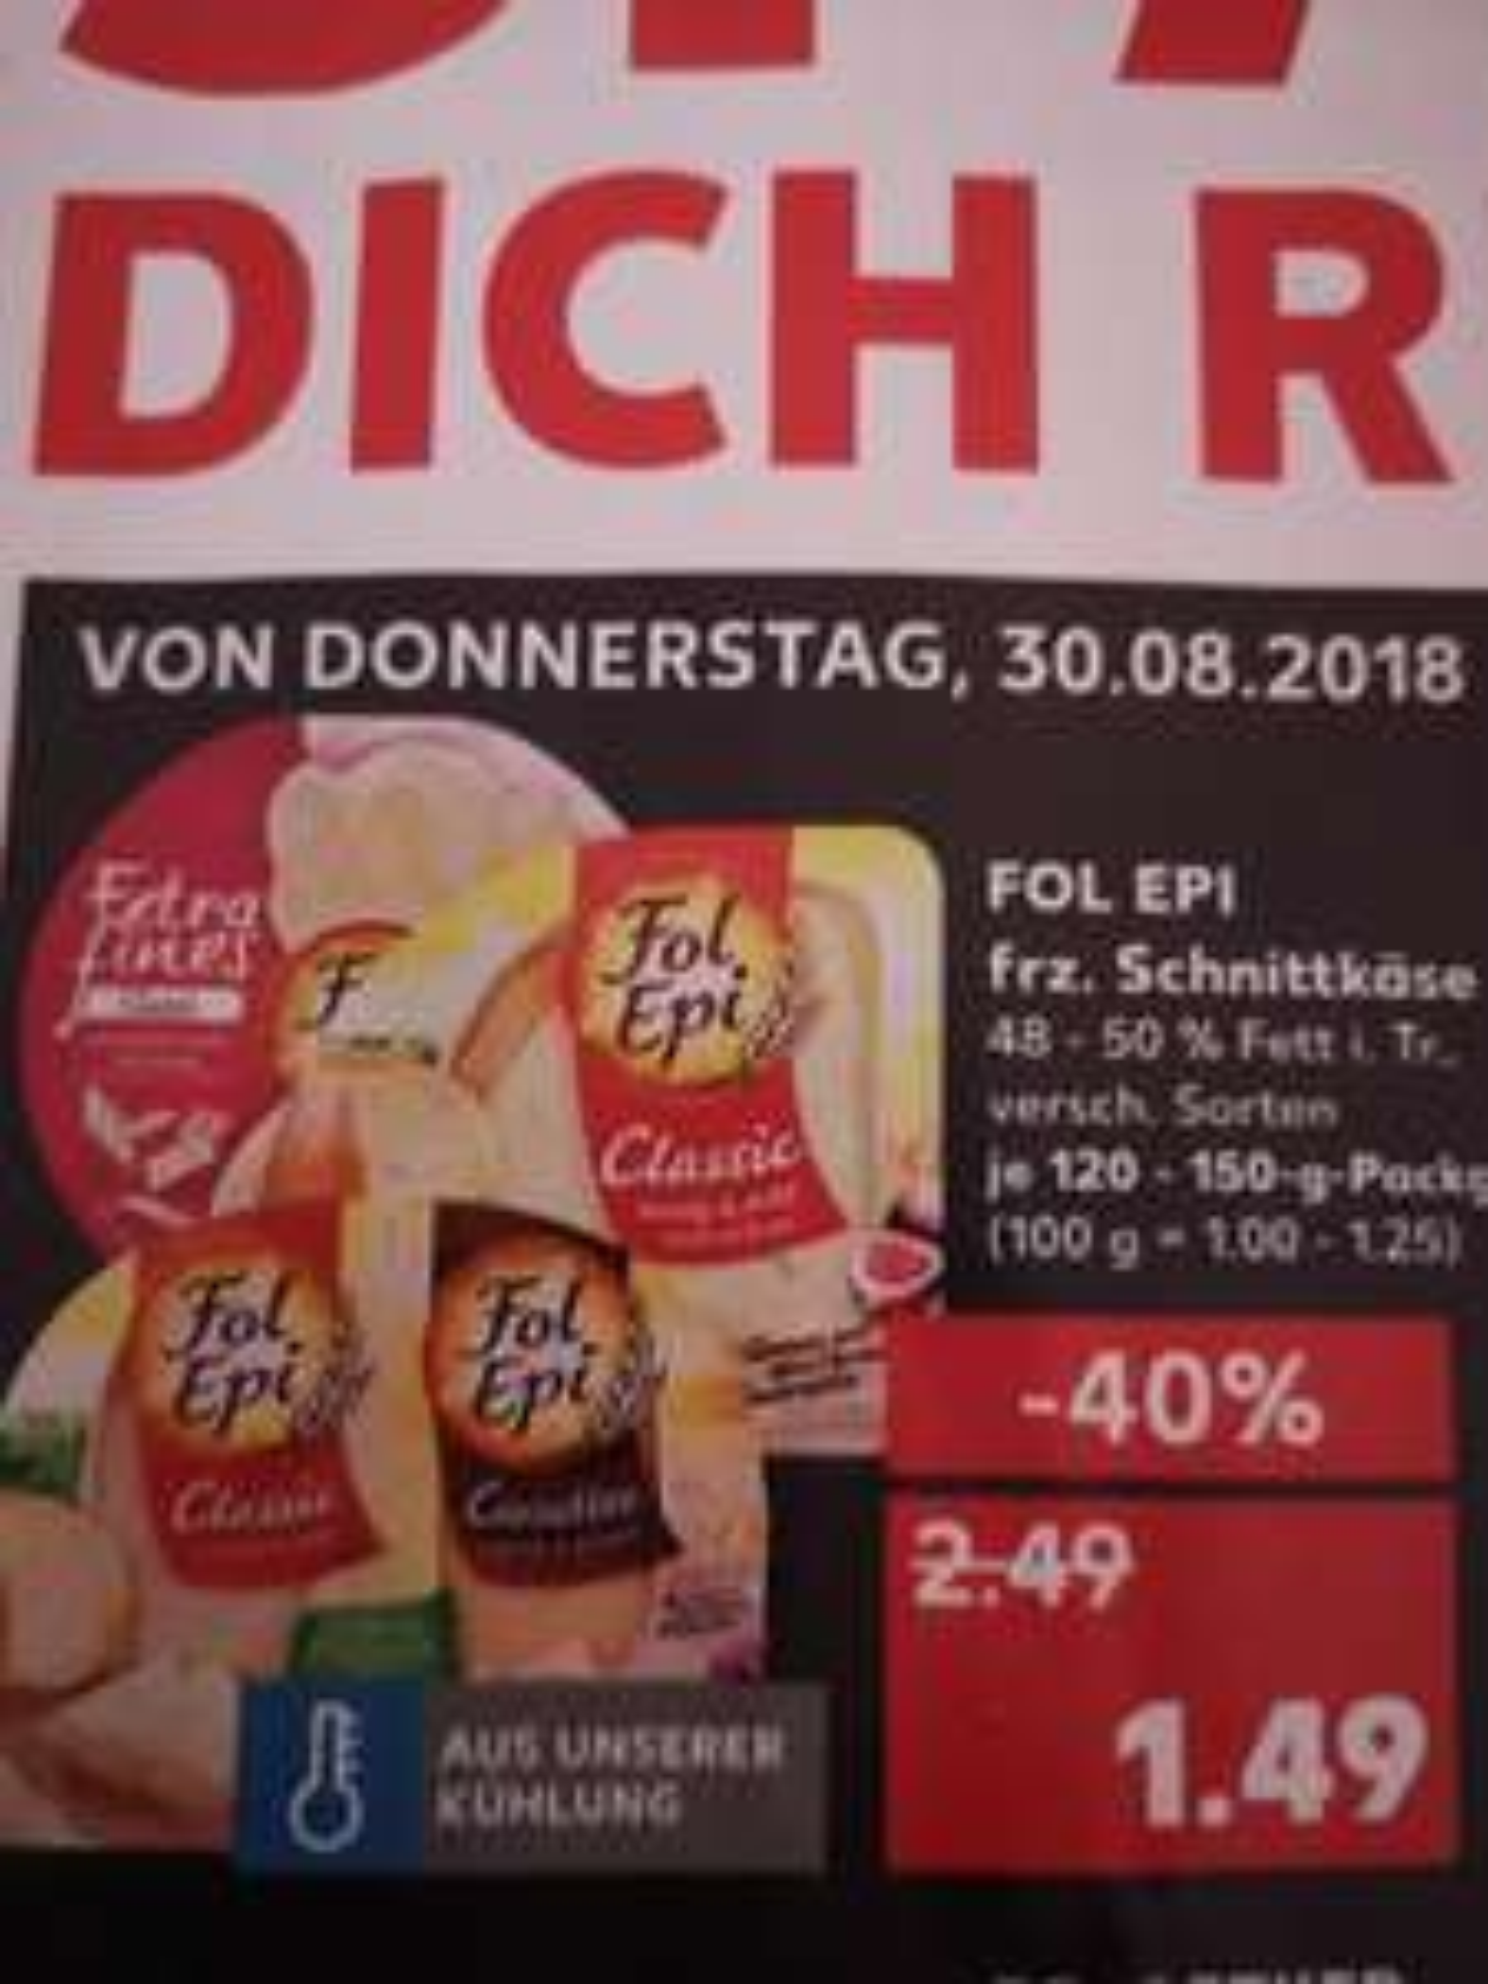 Kaufland - Fol Epi - Kracherpreis